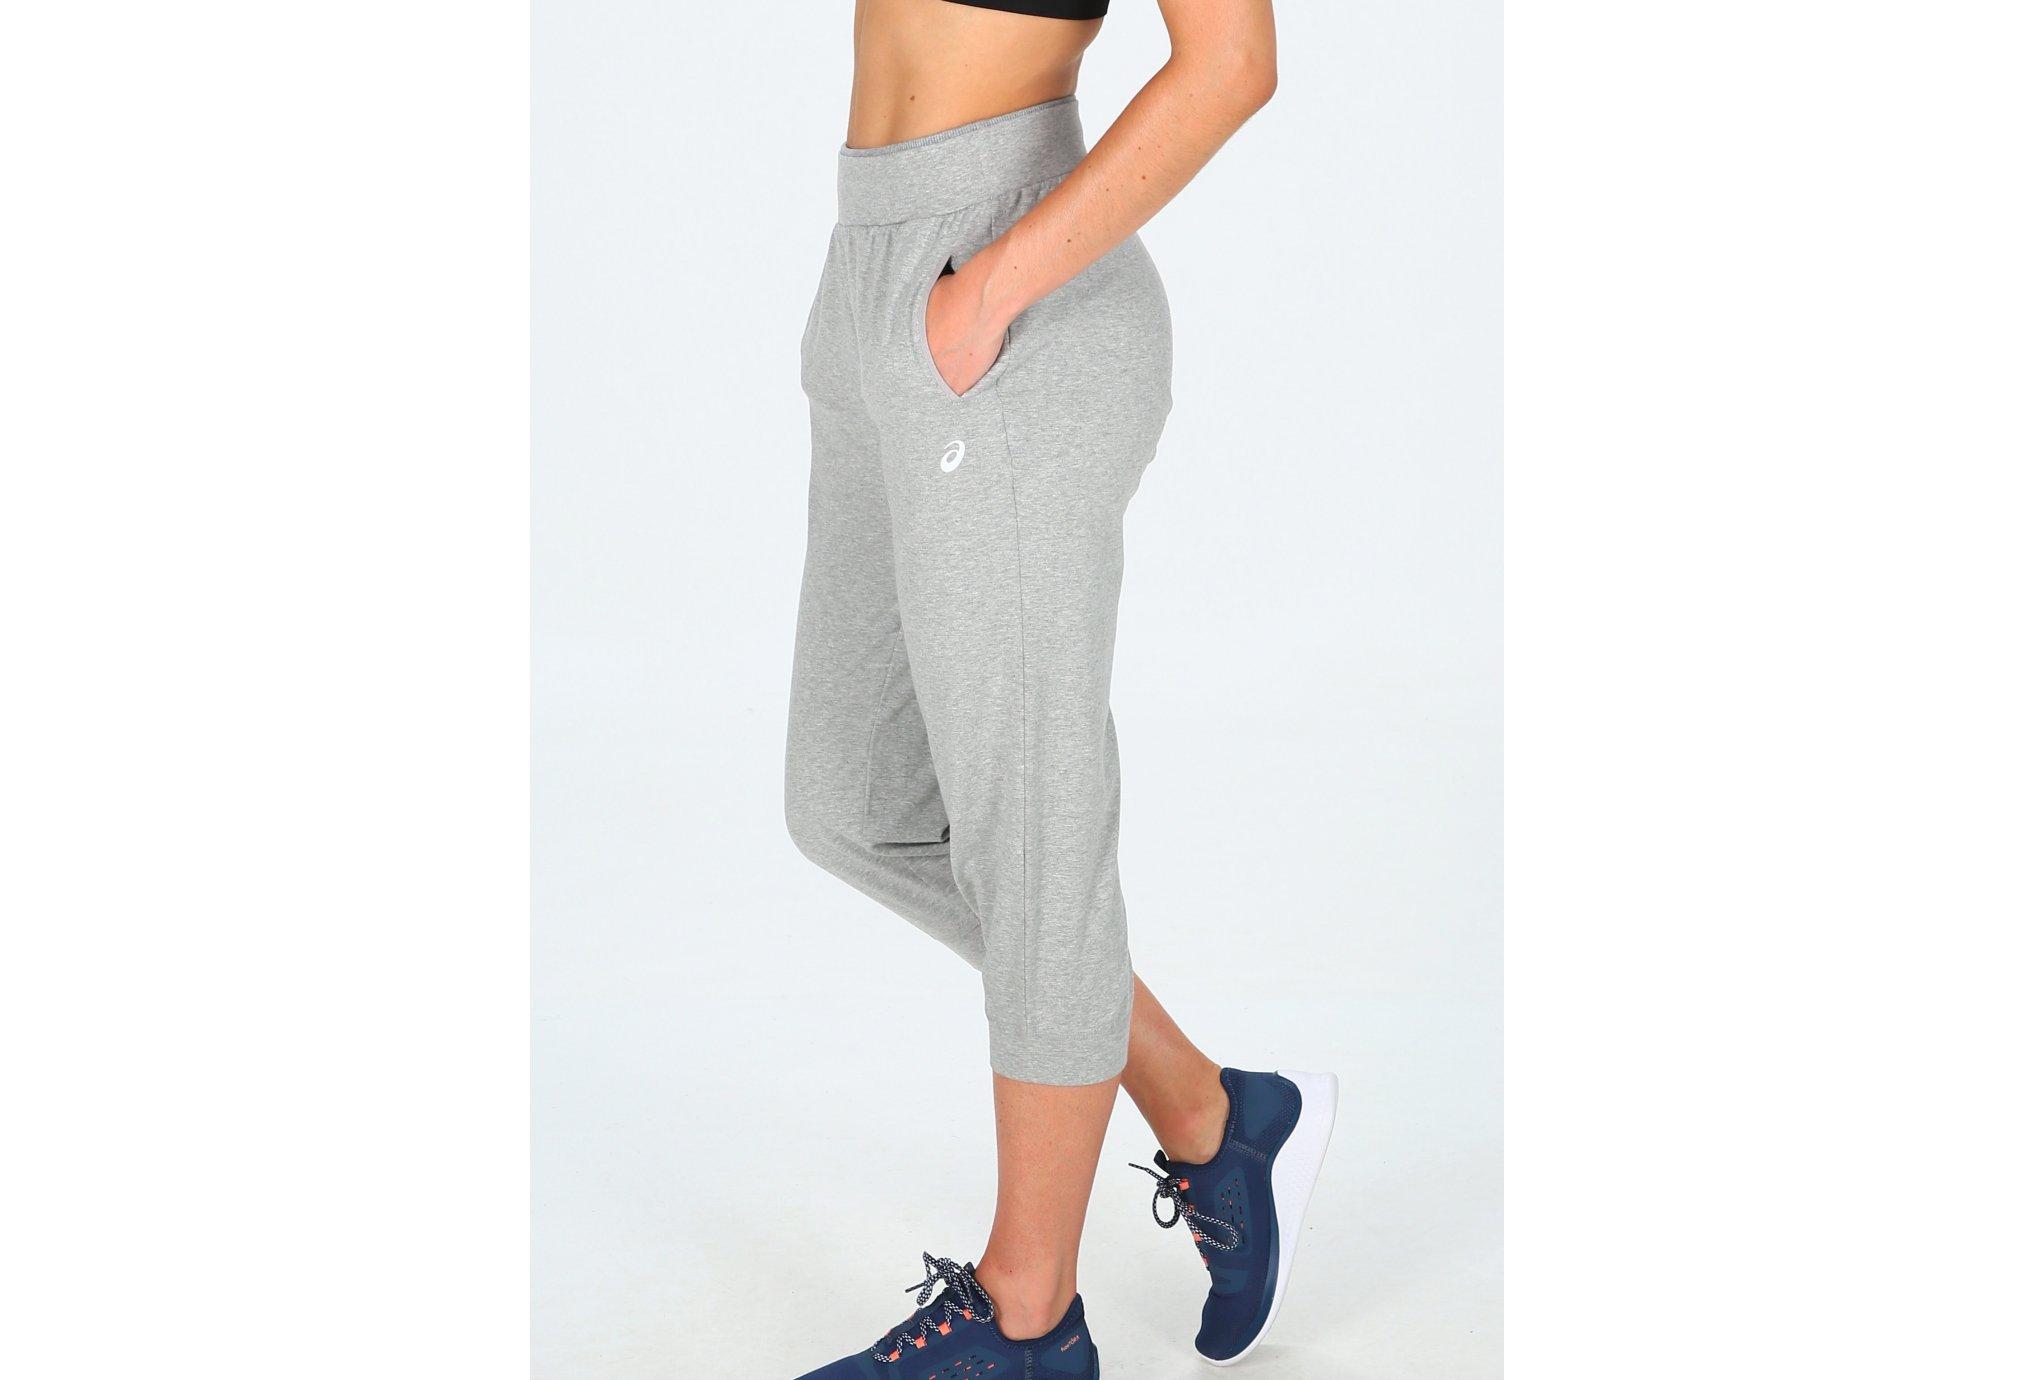 Asics Styled W Diététique Vêtements femme